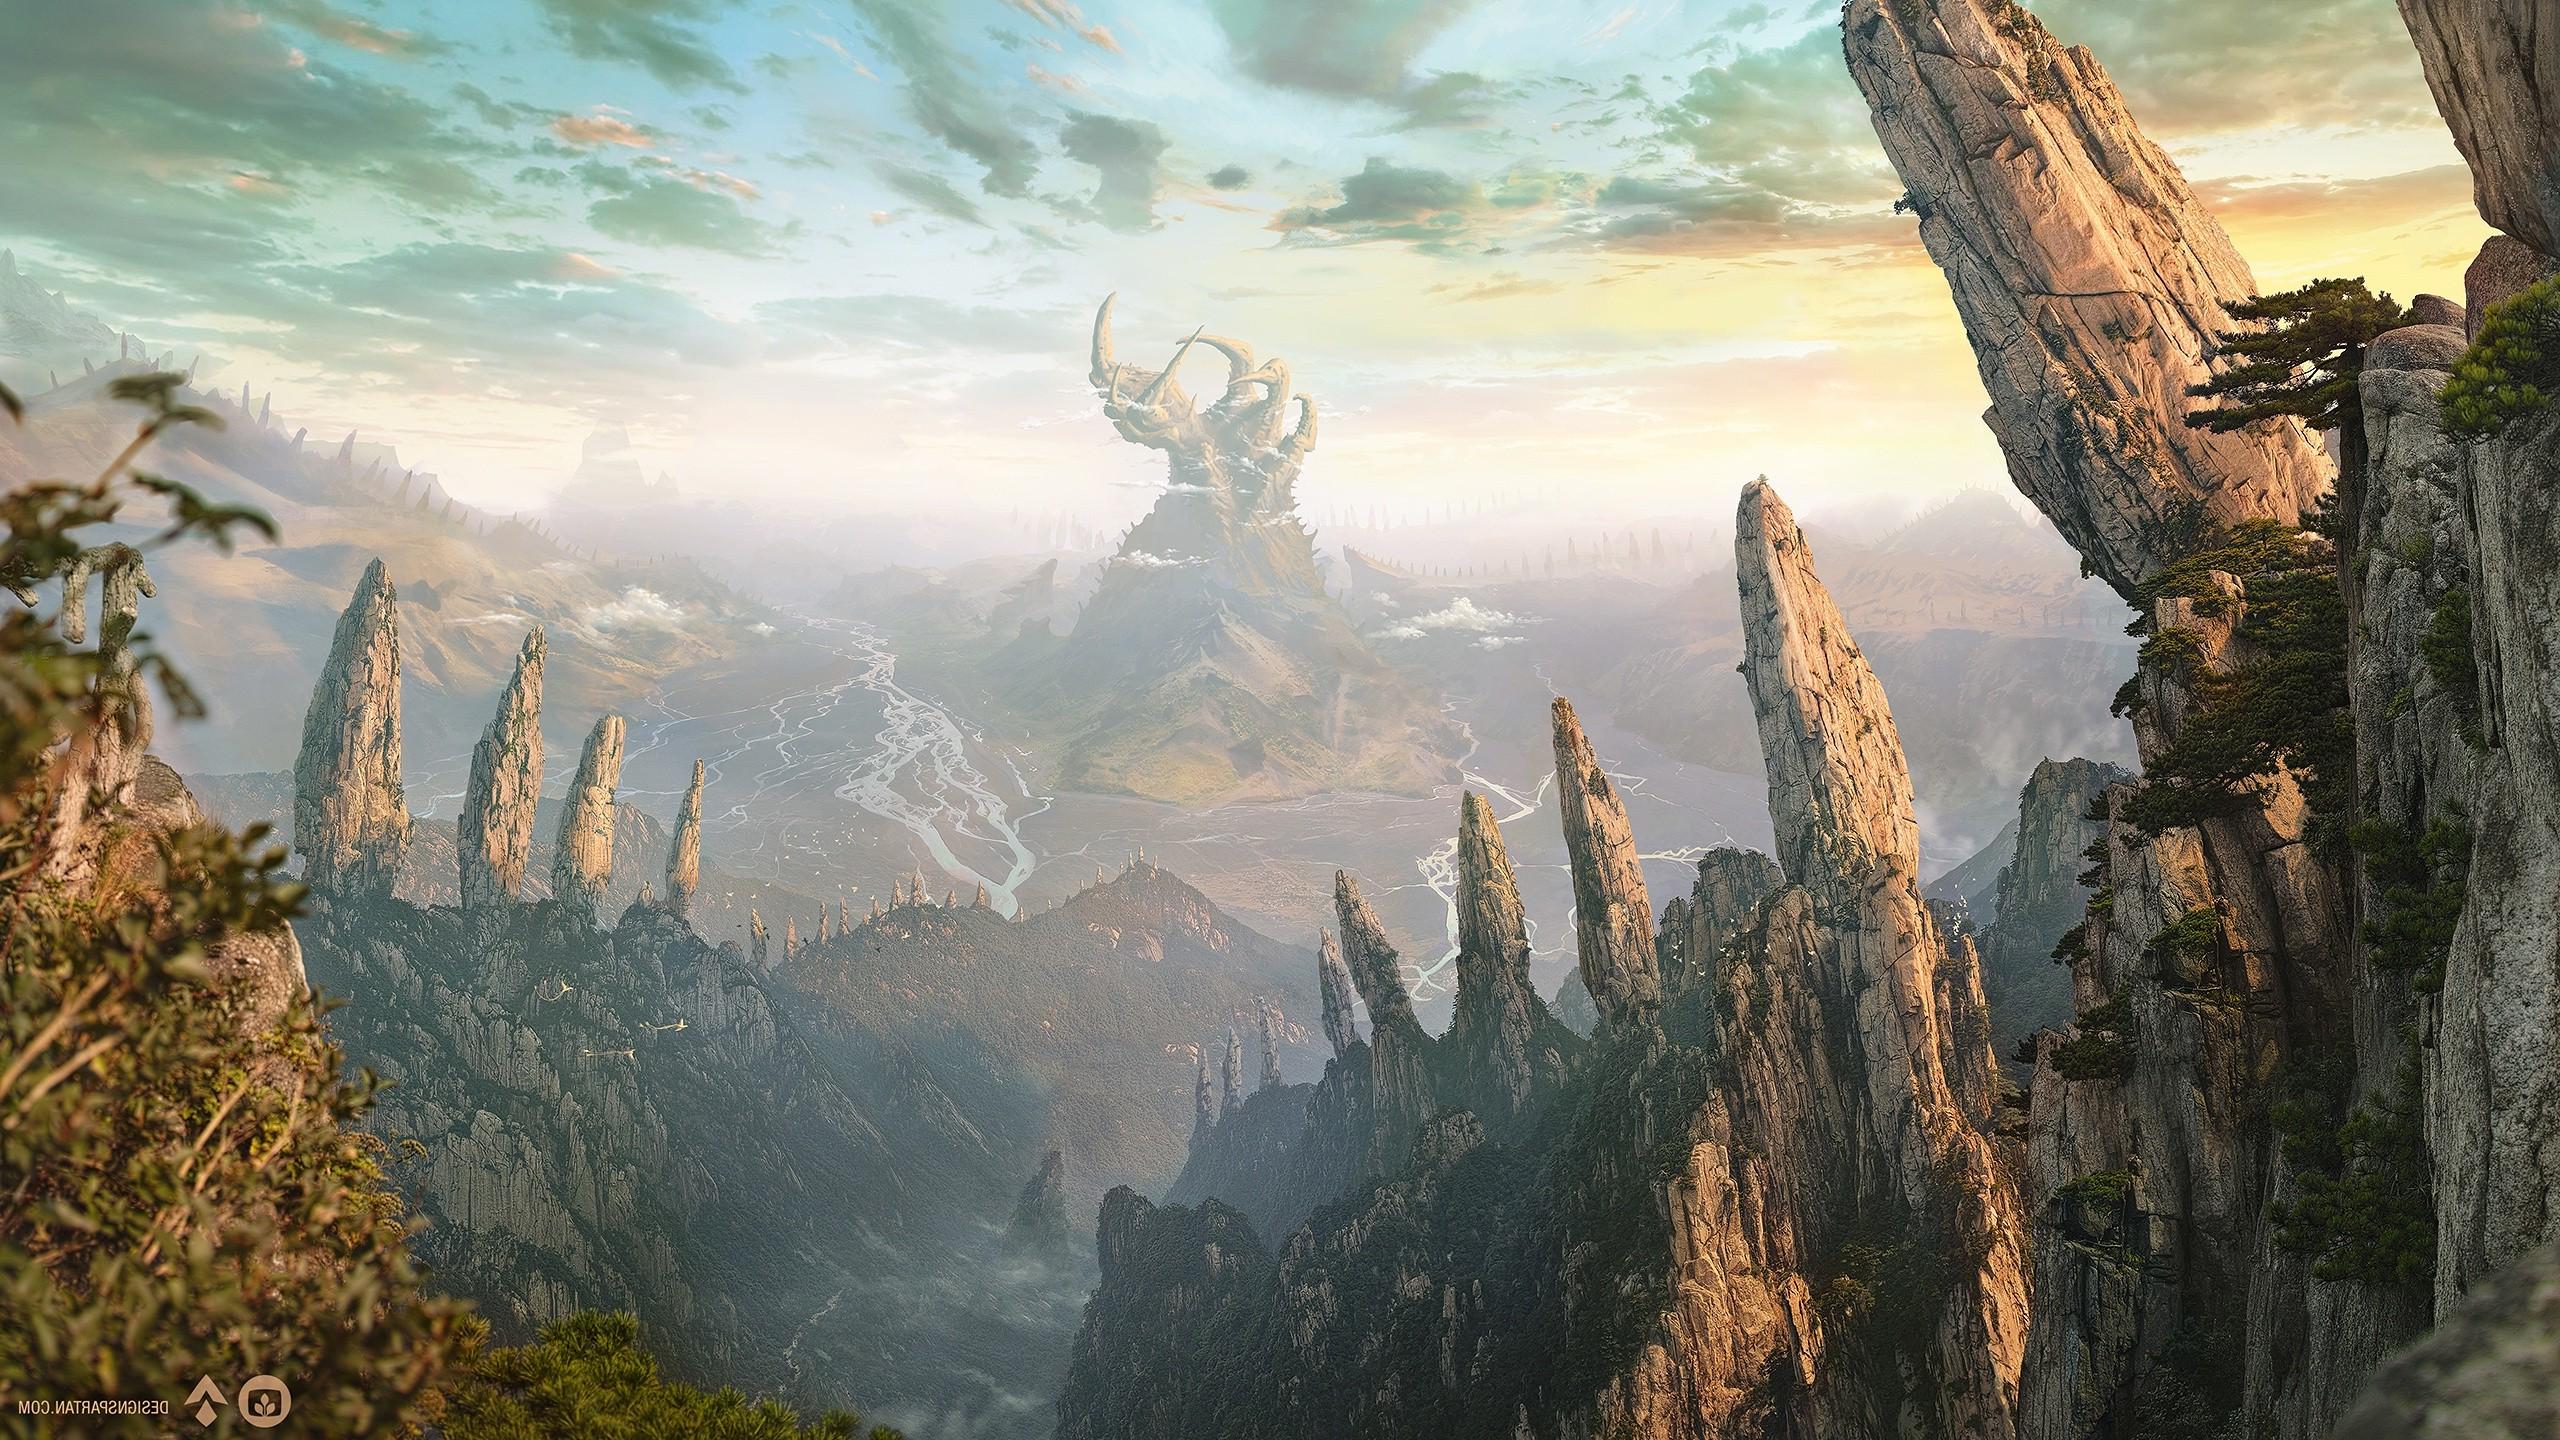 Wonderful Wallpaper Mountain Fantasy - 2560x1440-px-artwork-digital-art-fantasy-art-landscape-mountain-nature-1104732  Collection_88269.jpg